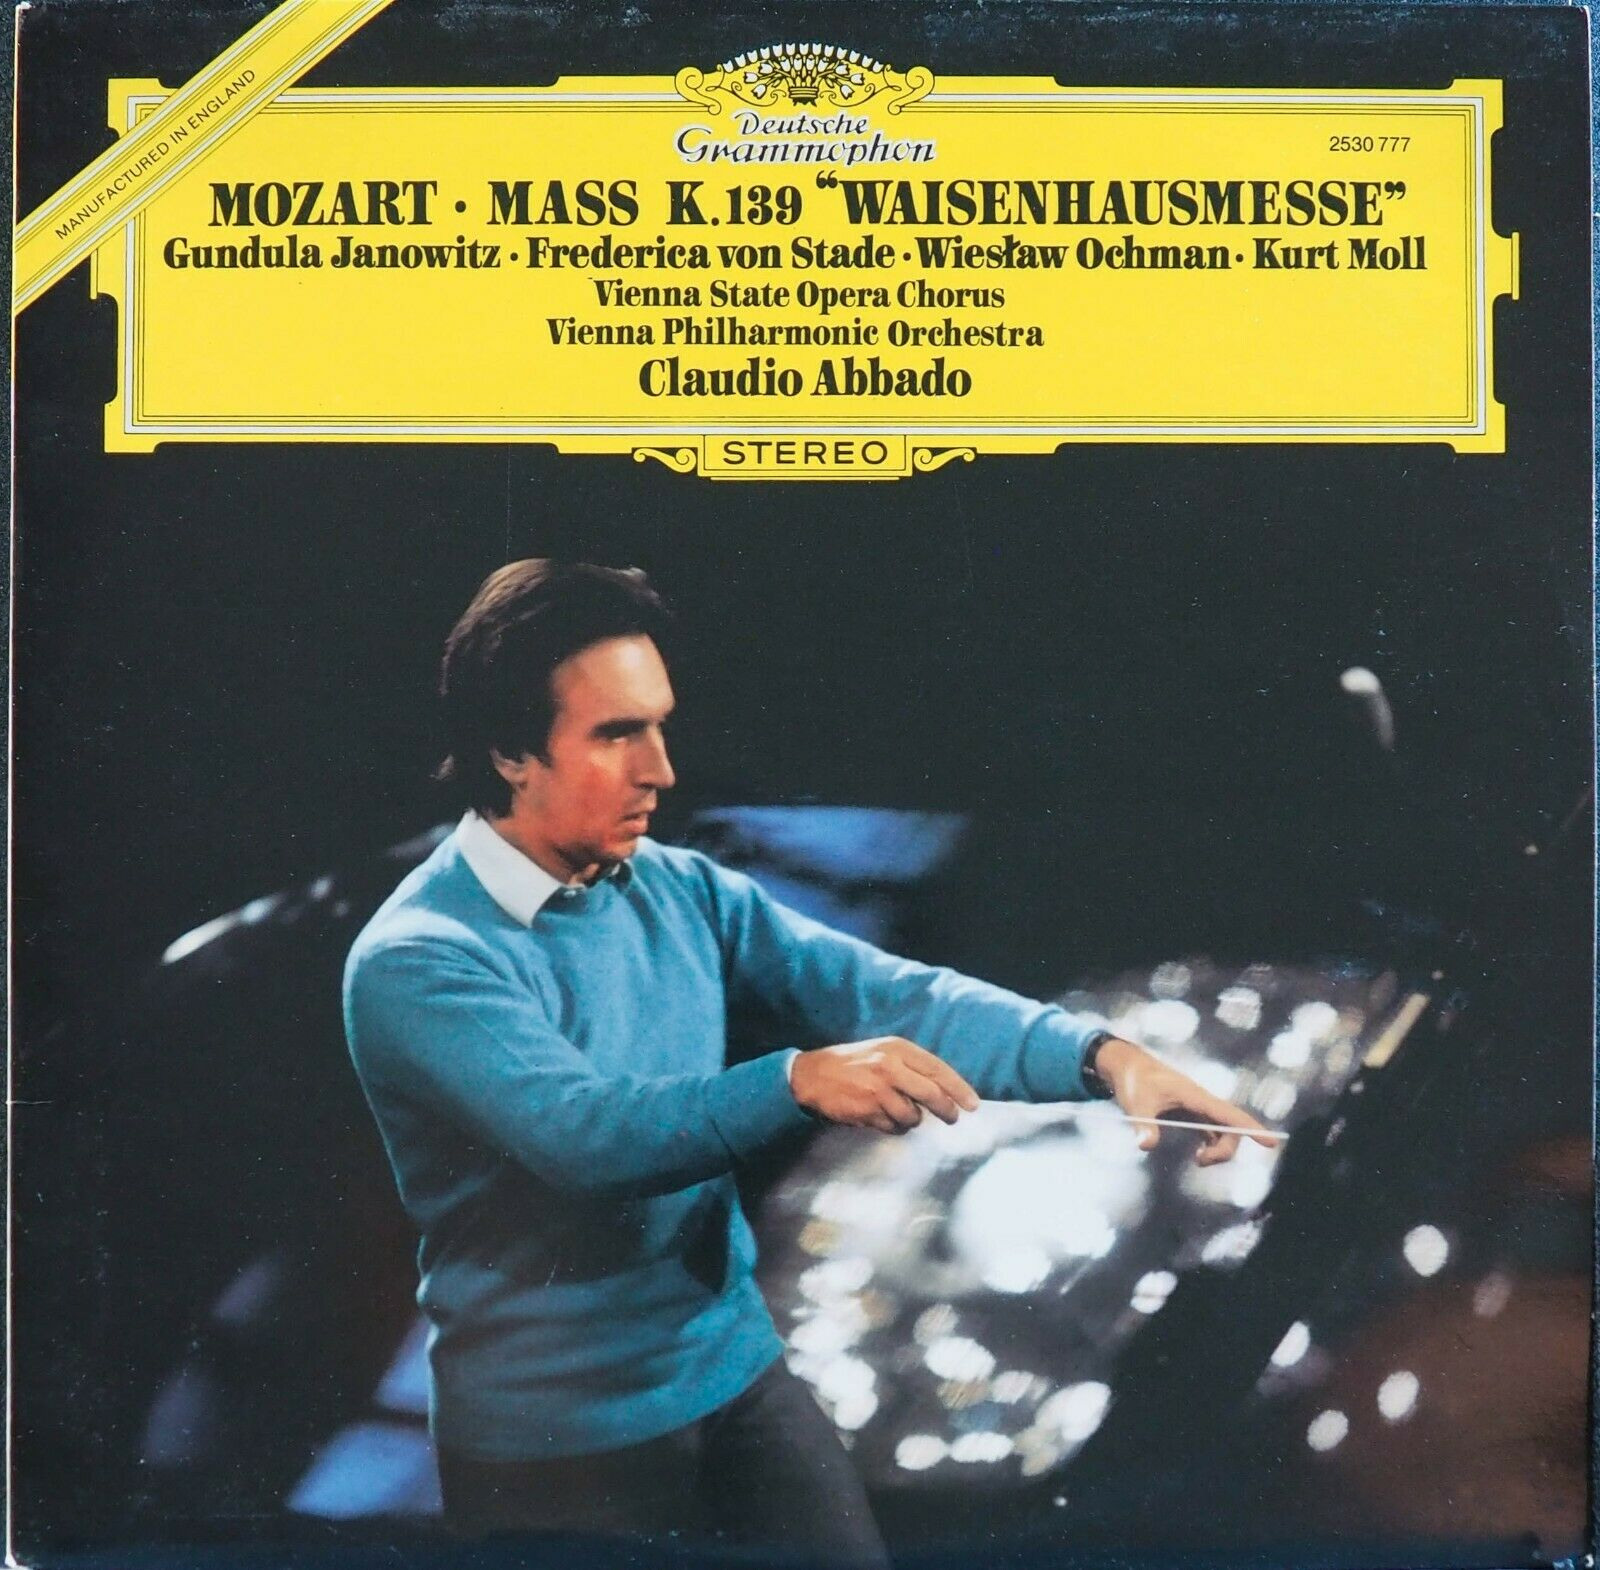 DG 2530 777 Mozart Missa Solemnis,K.139/VPO/Abbado,UK - $3.00